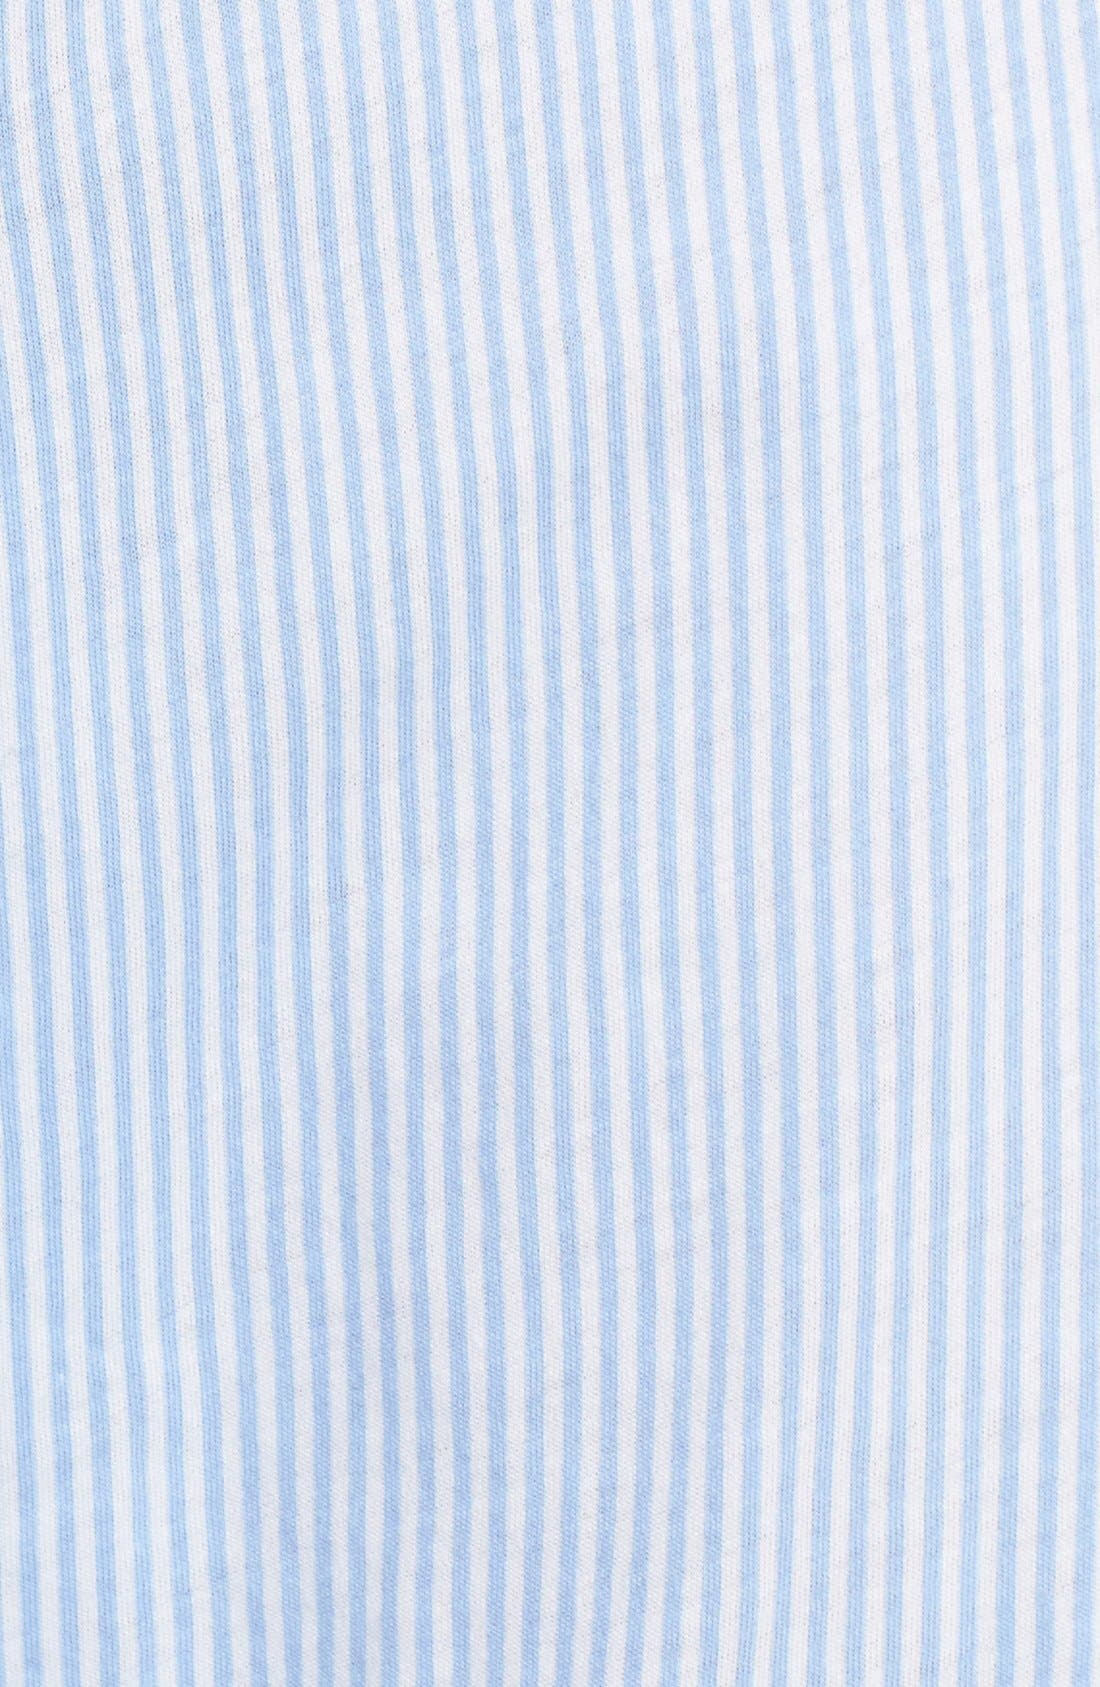 LAUREN RALPH LAUREN, Logo Waistband Lounge Pants, Alternate thumbnail 5, color, STRIPE PALE BLUE/ WHITE